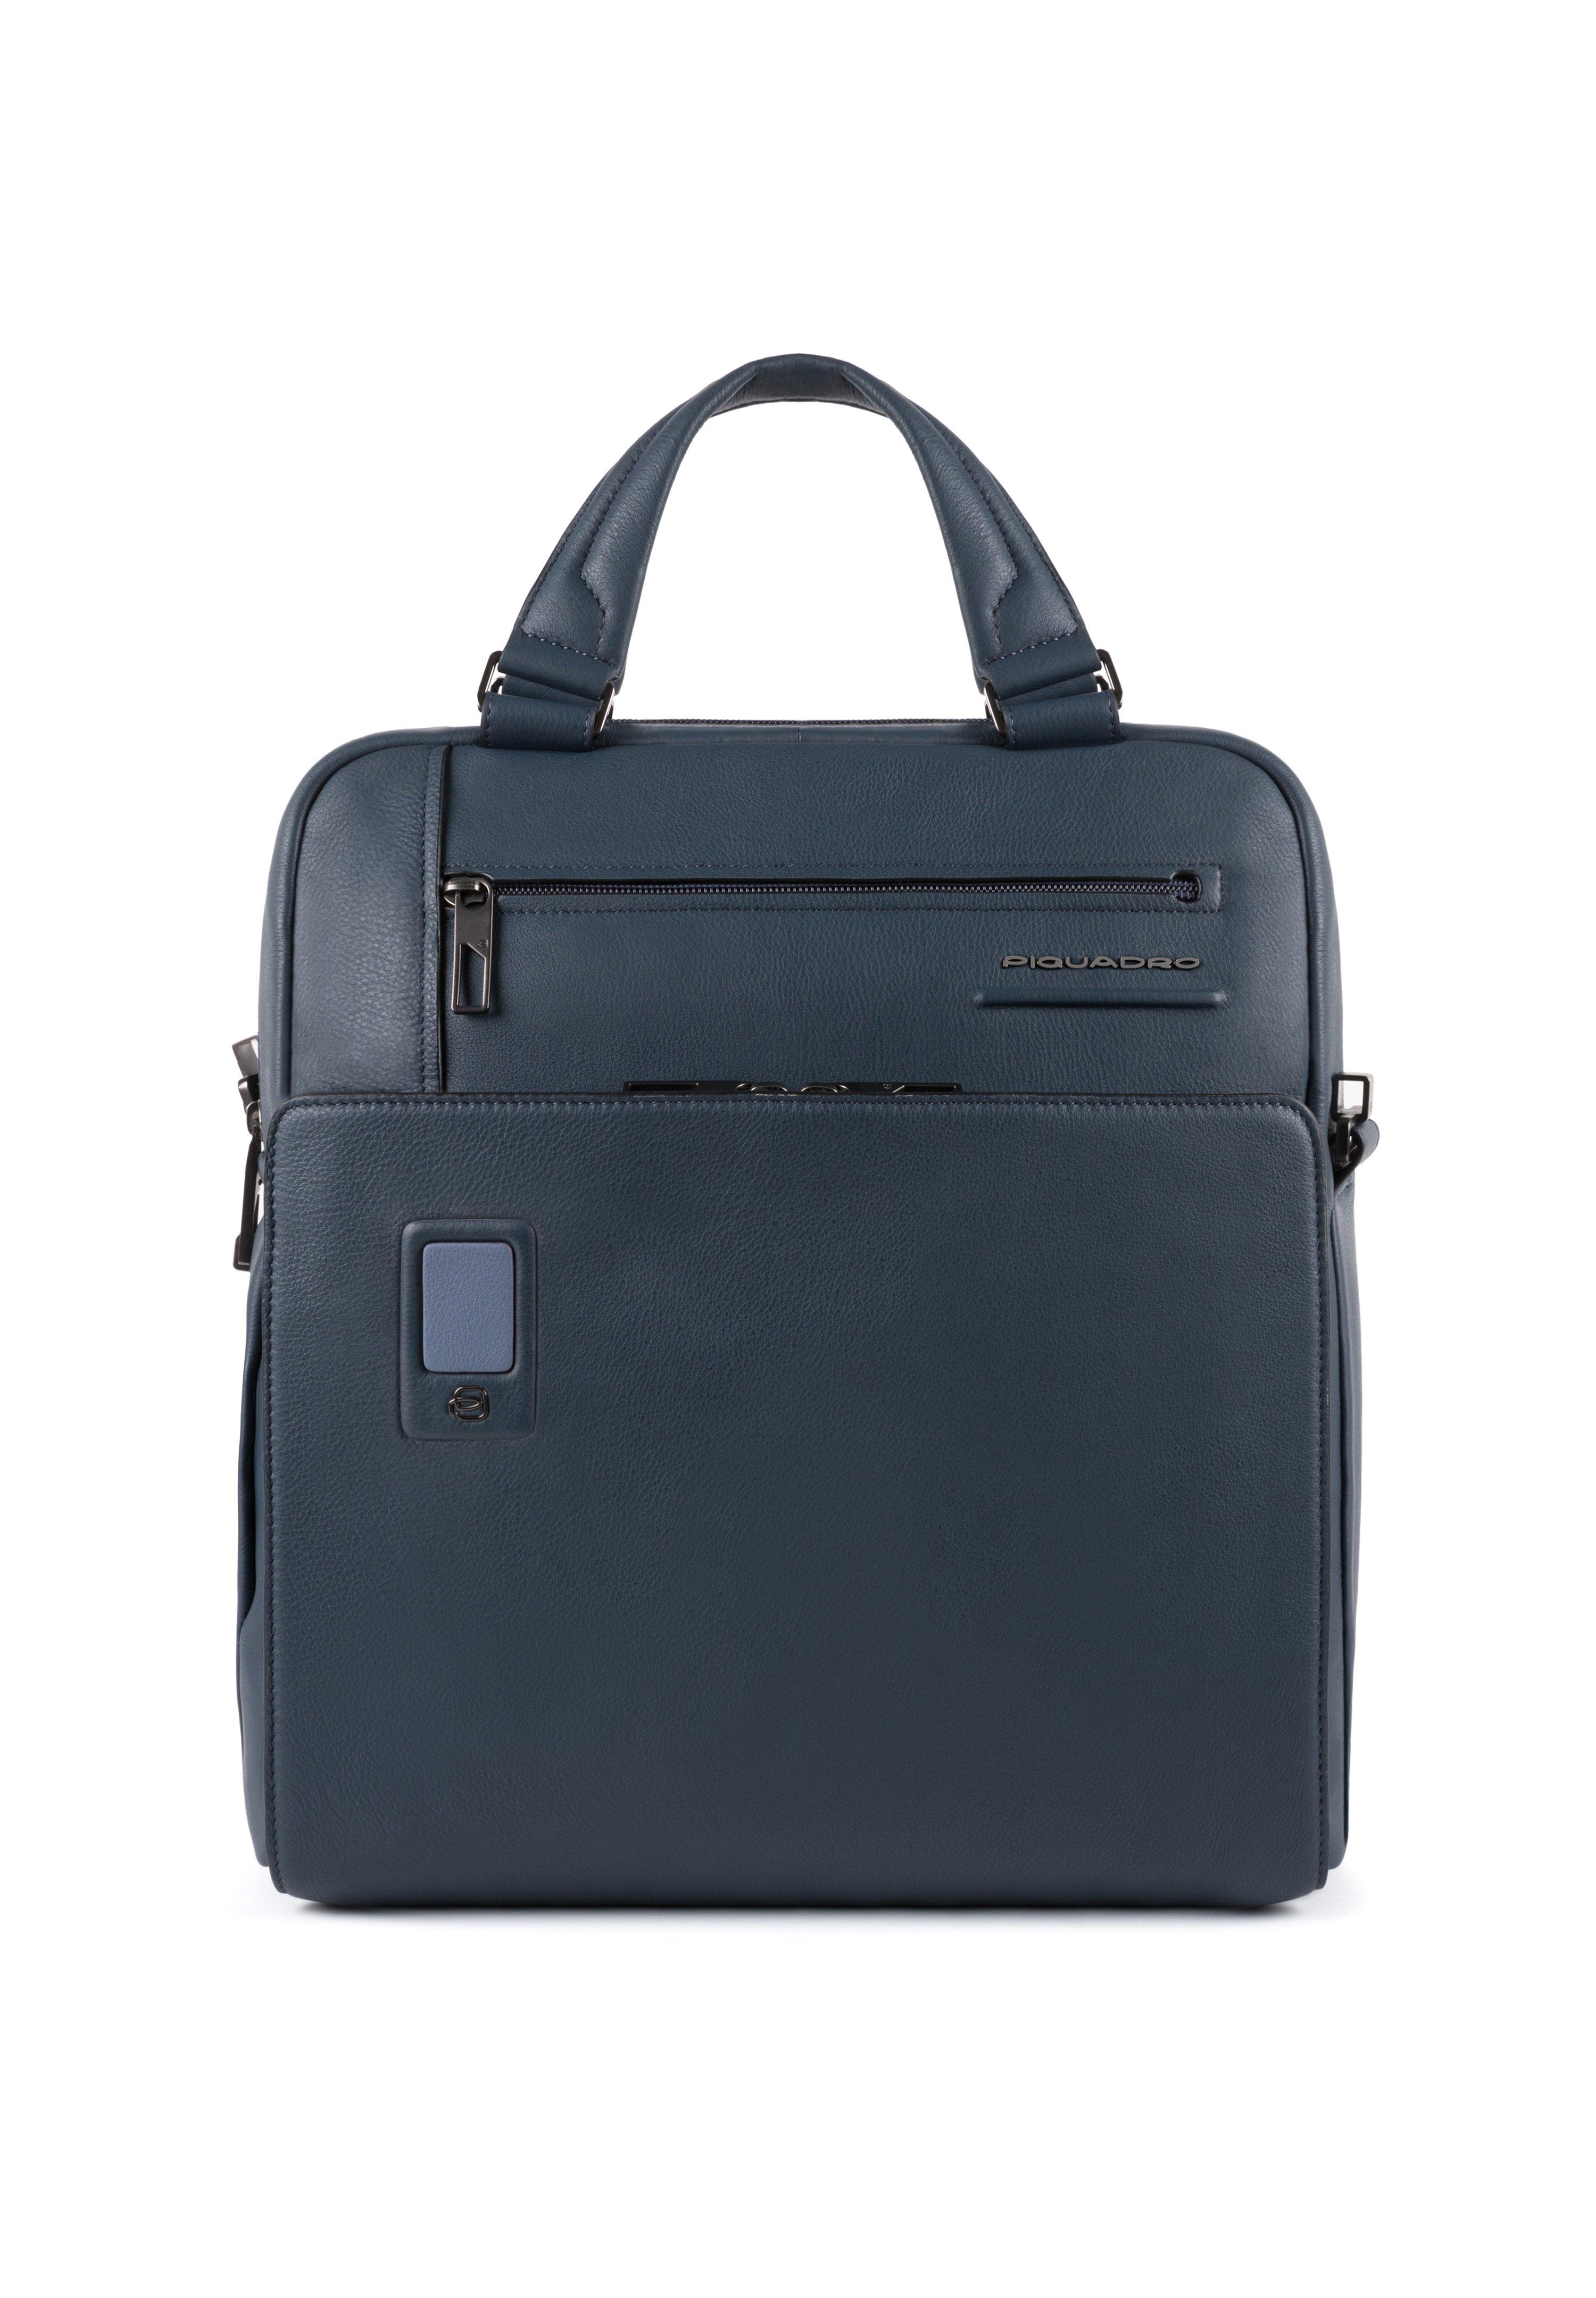 Piquadro Akron Laptoptasche Leder 33 Cm Laptopfach - Rugzak Blue rggnijG